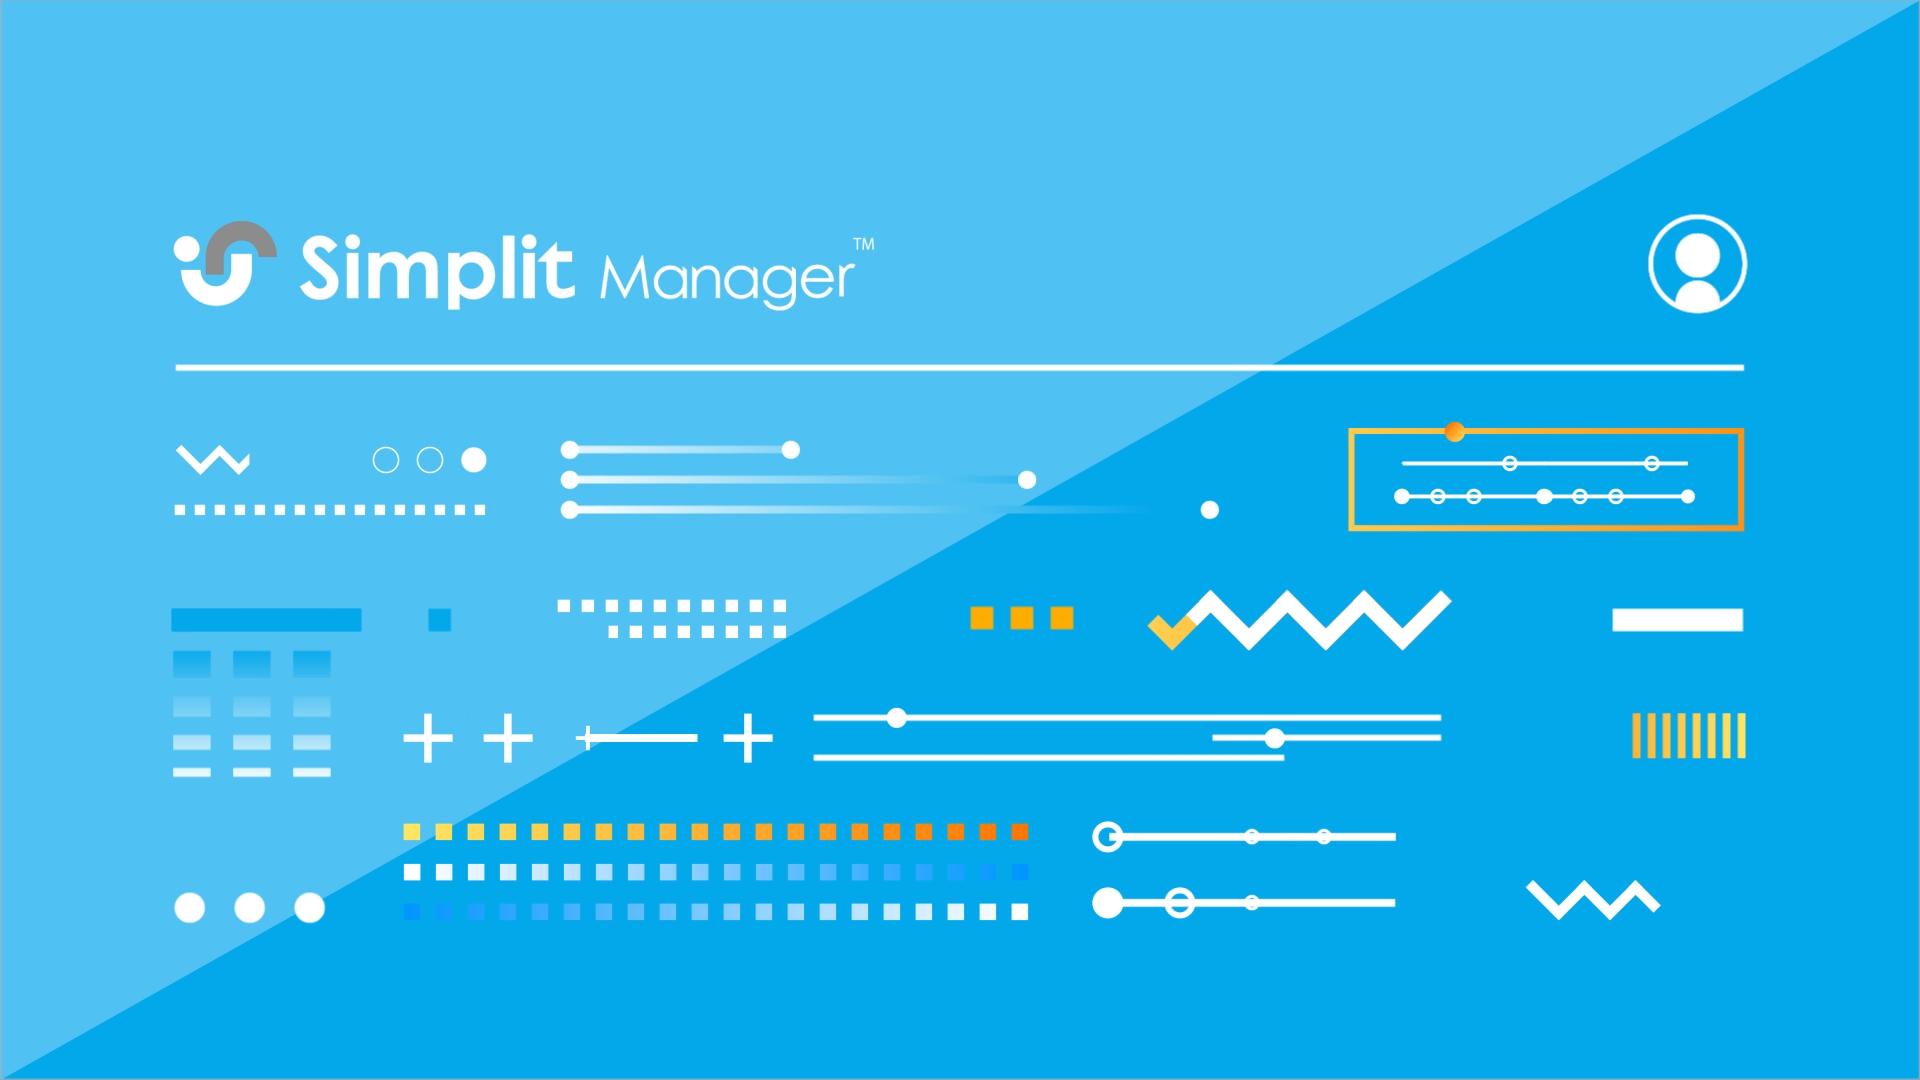 Simplit Manager